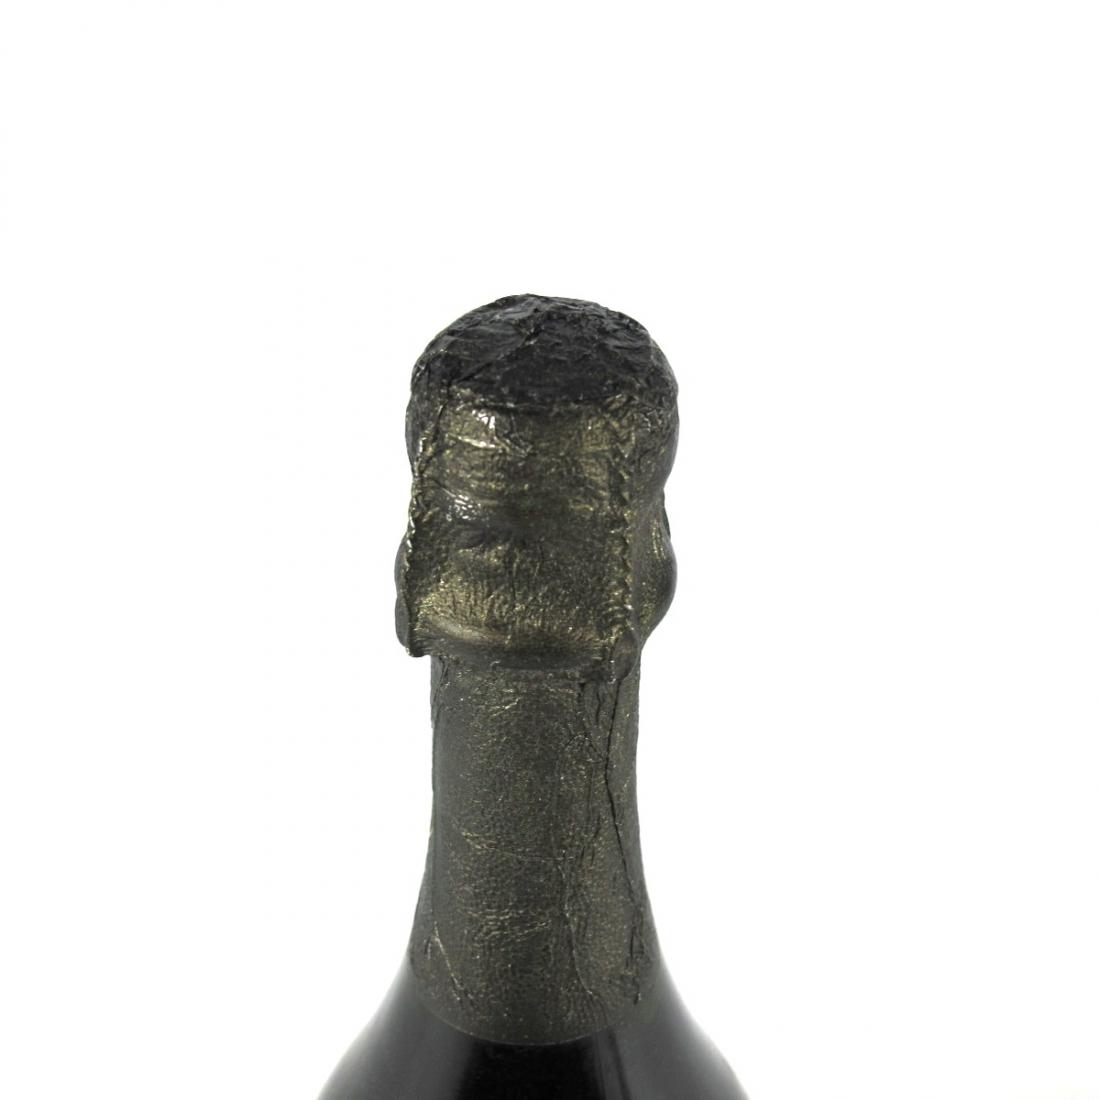 Dom Perignon Brut Vintage 1985 Champagne